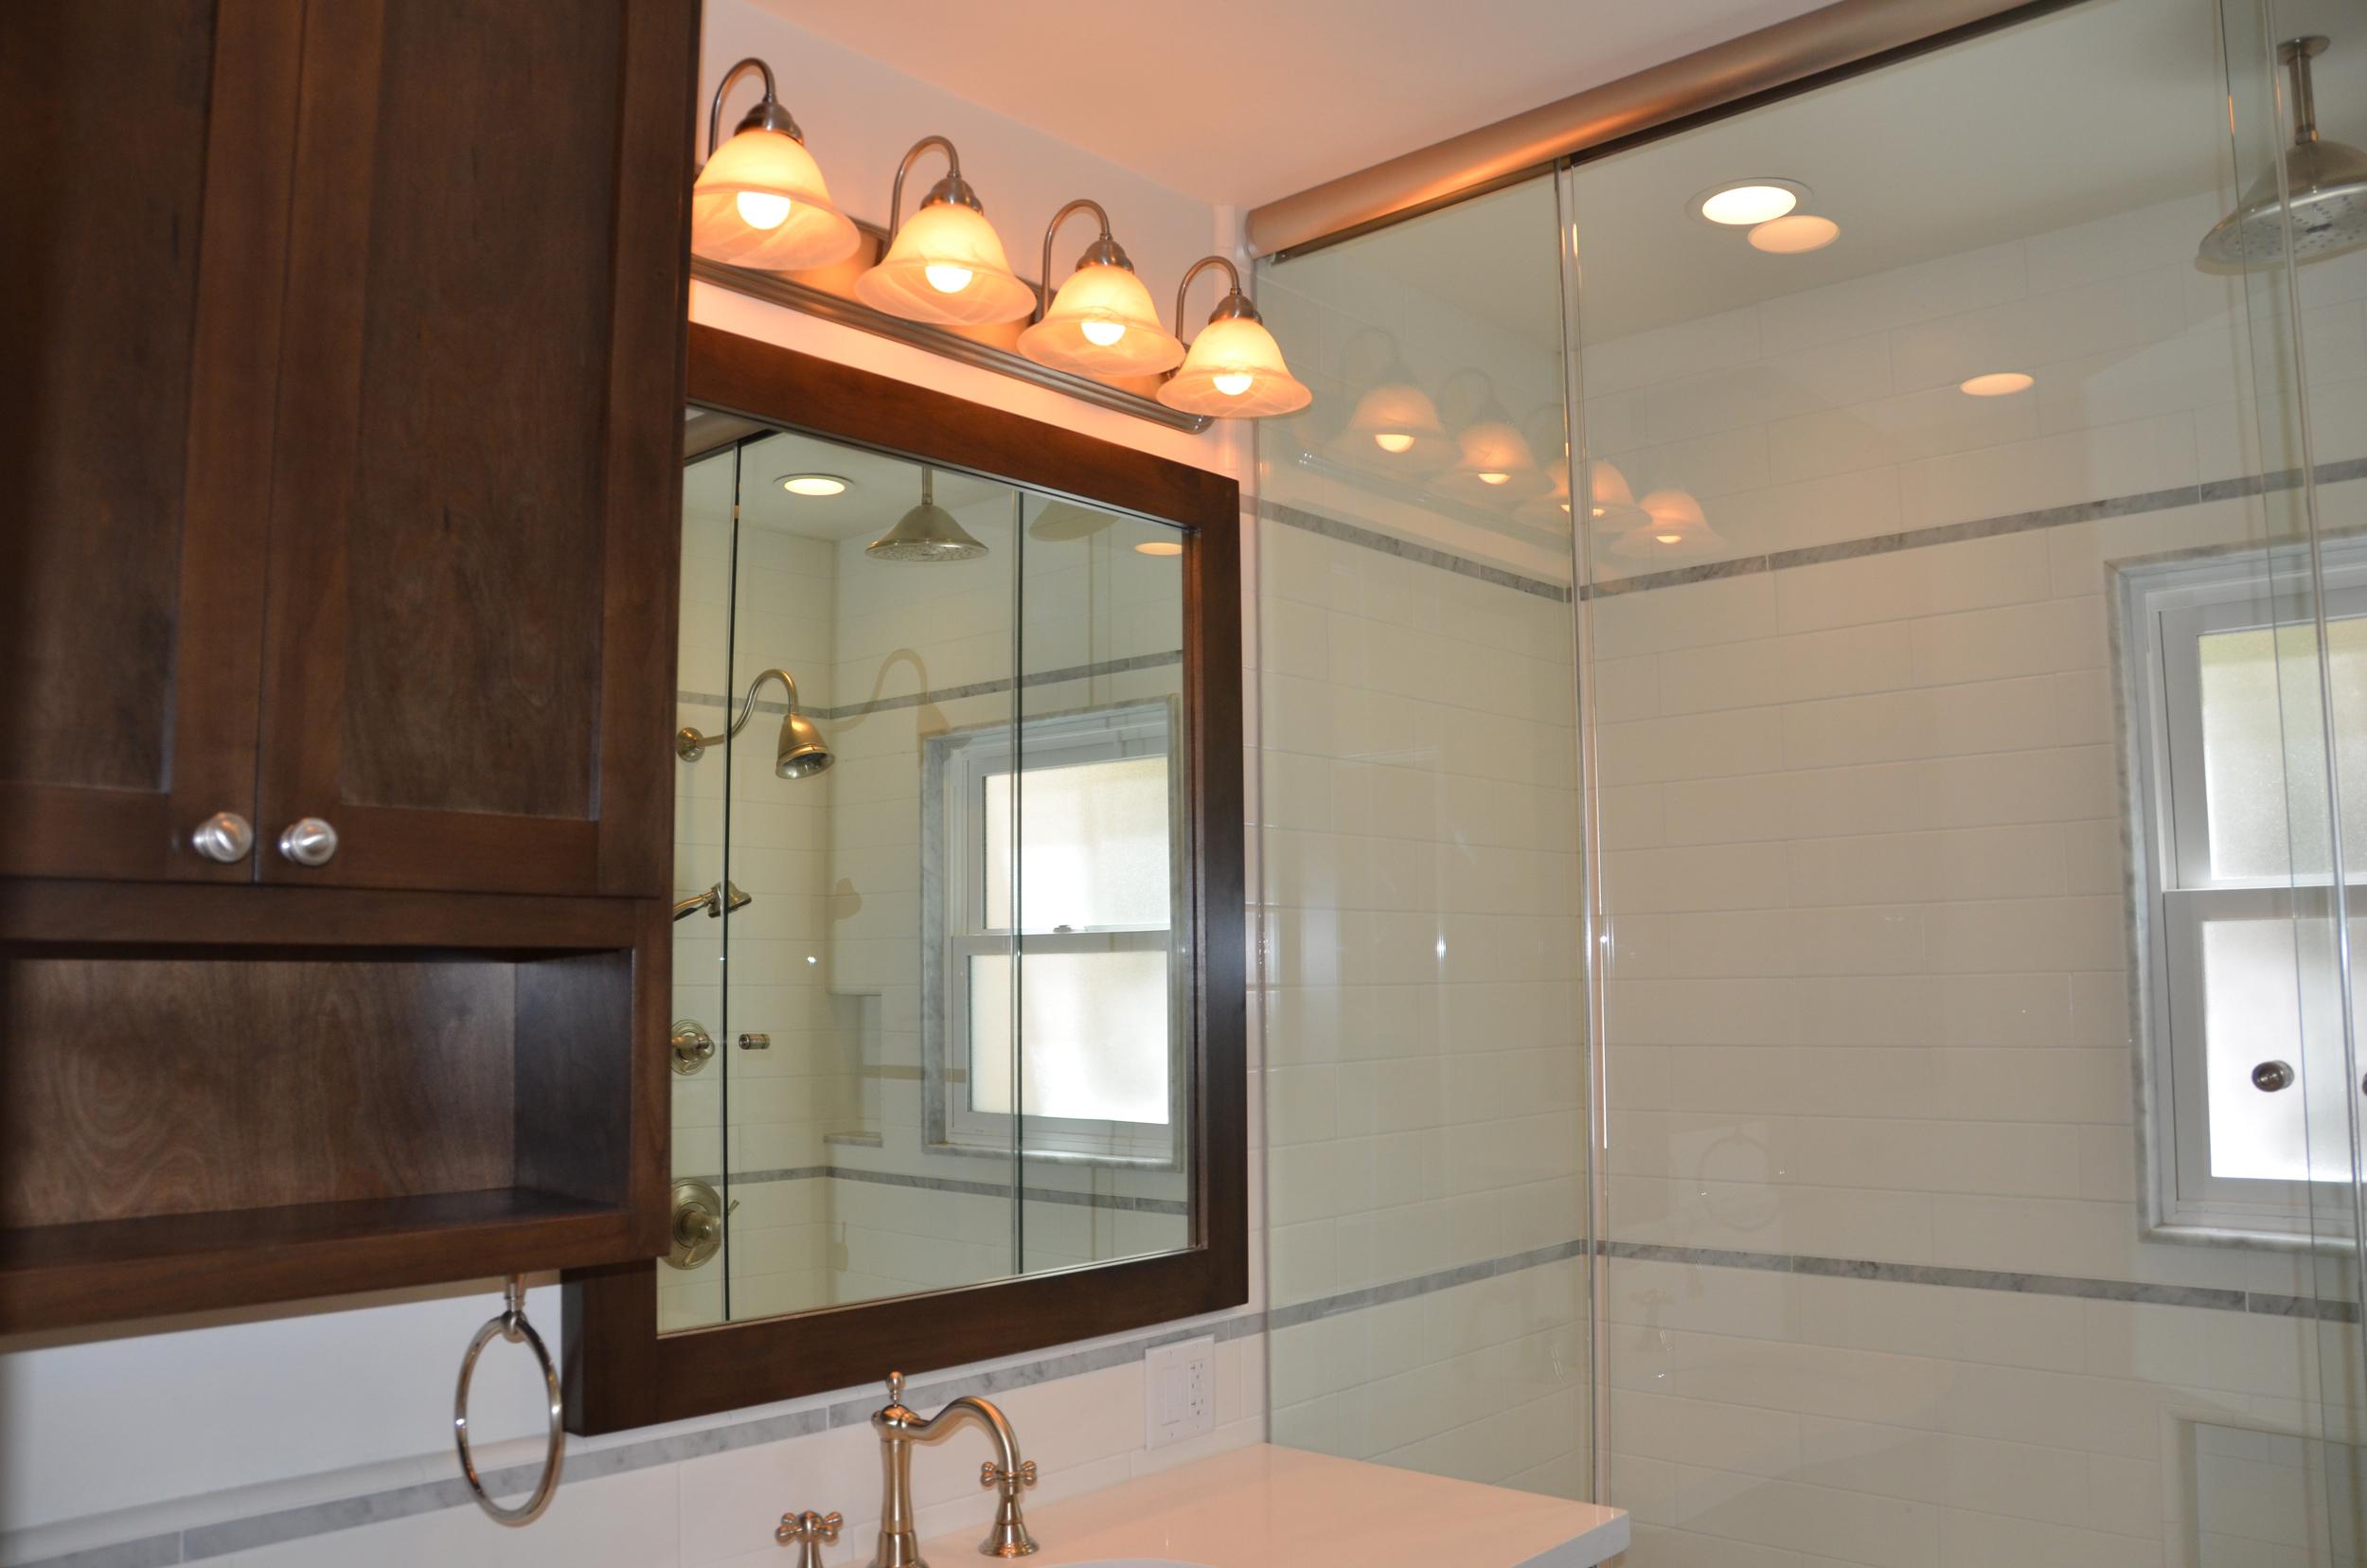 Bathroom-dark-wood-medicine-cabinet-lights.JPG